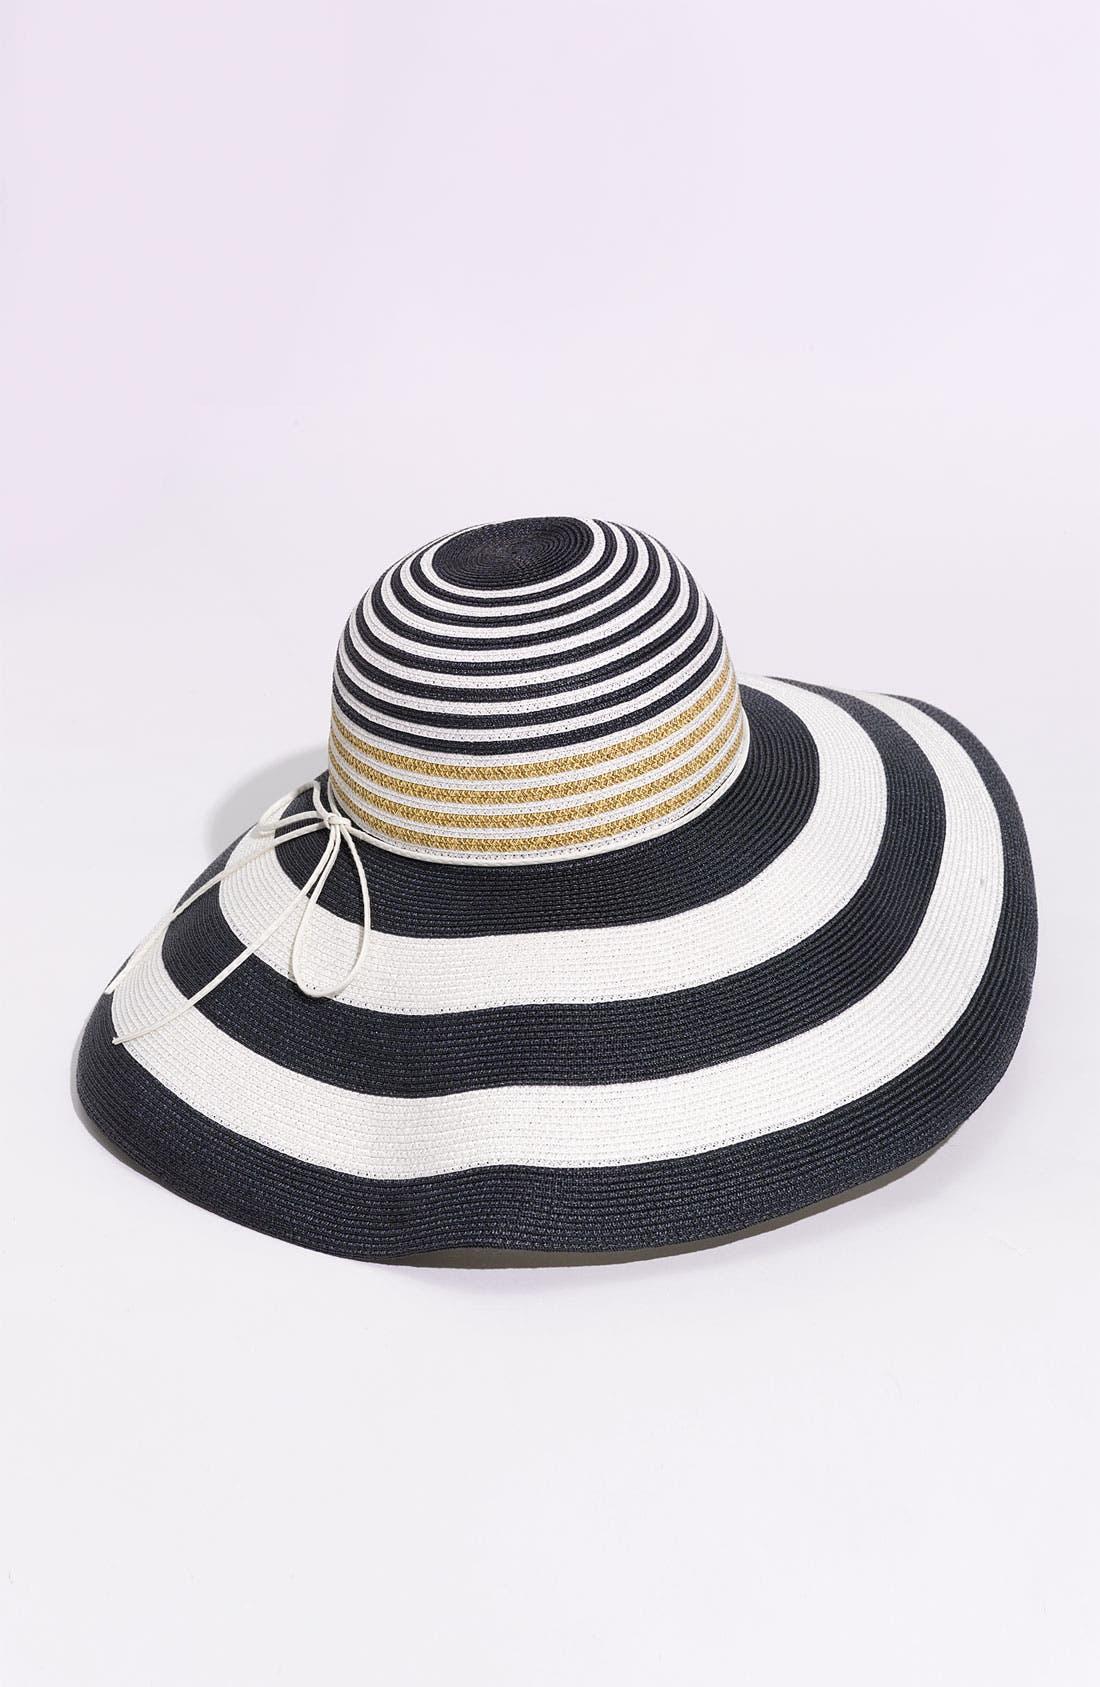 Alternate Image 2  - Laundry by Shelli Segal 'Nicole' Sun Hat